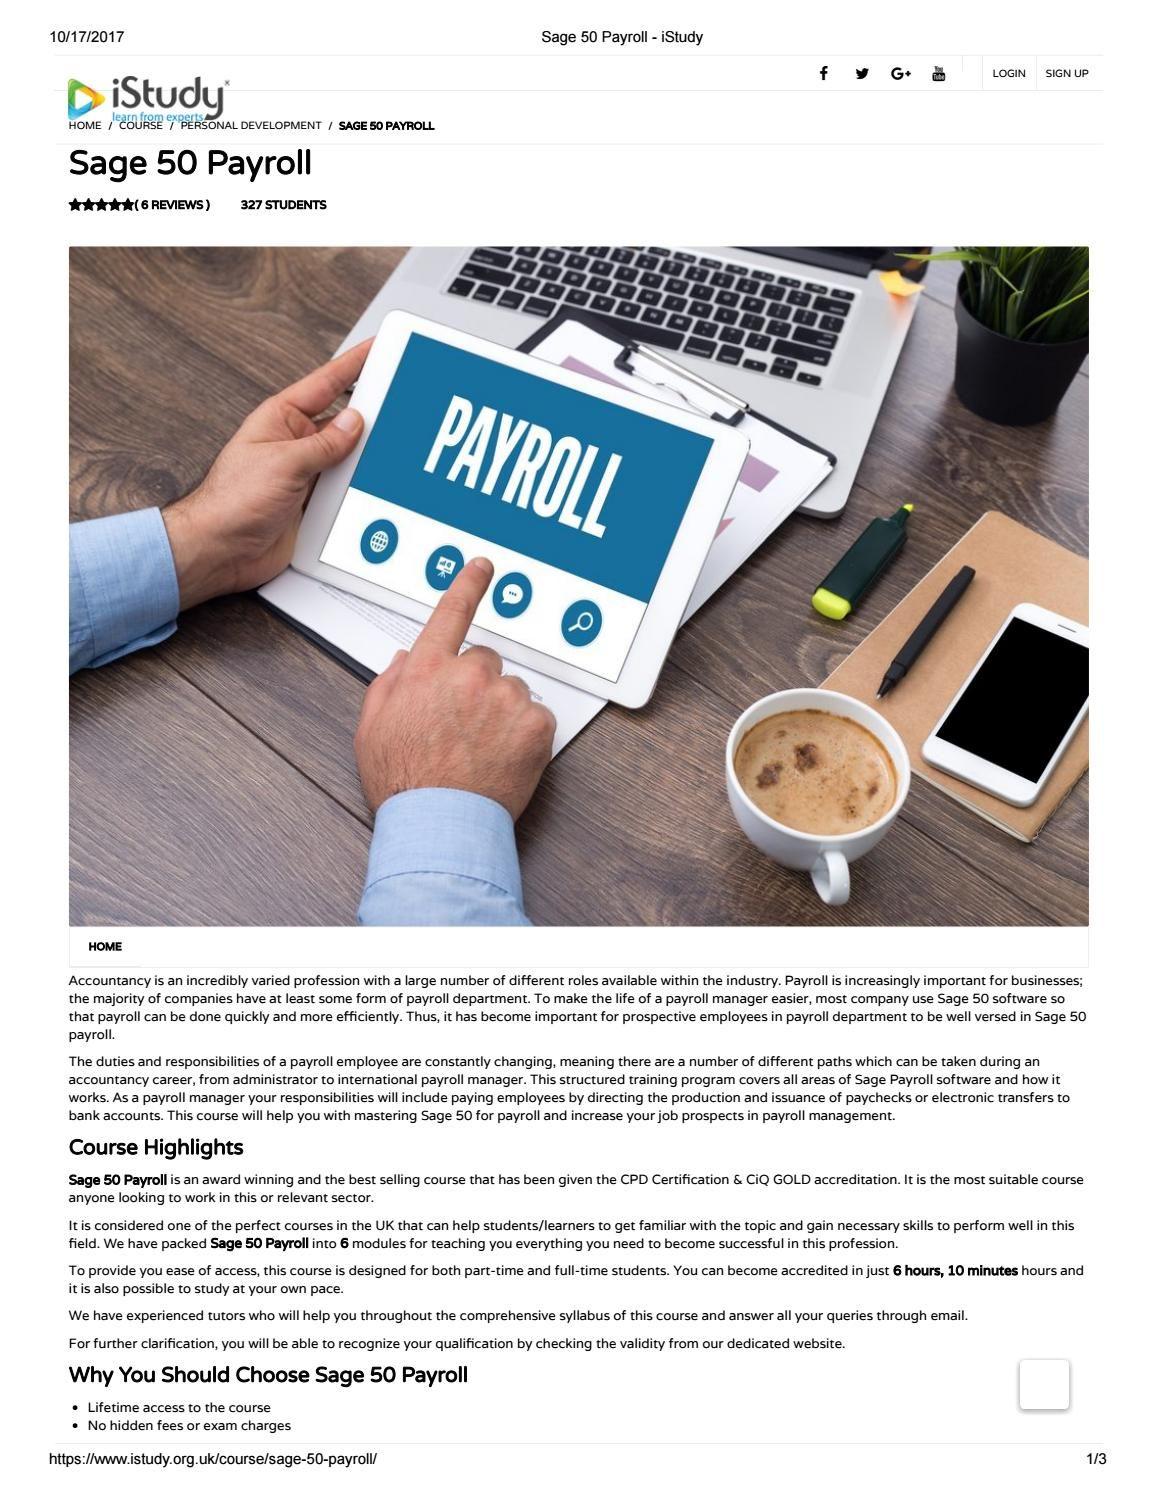 Sage 50 Payroll Istudy Personal Development Training Self